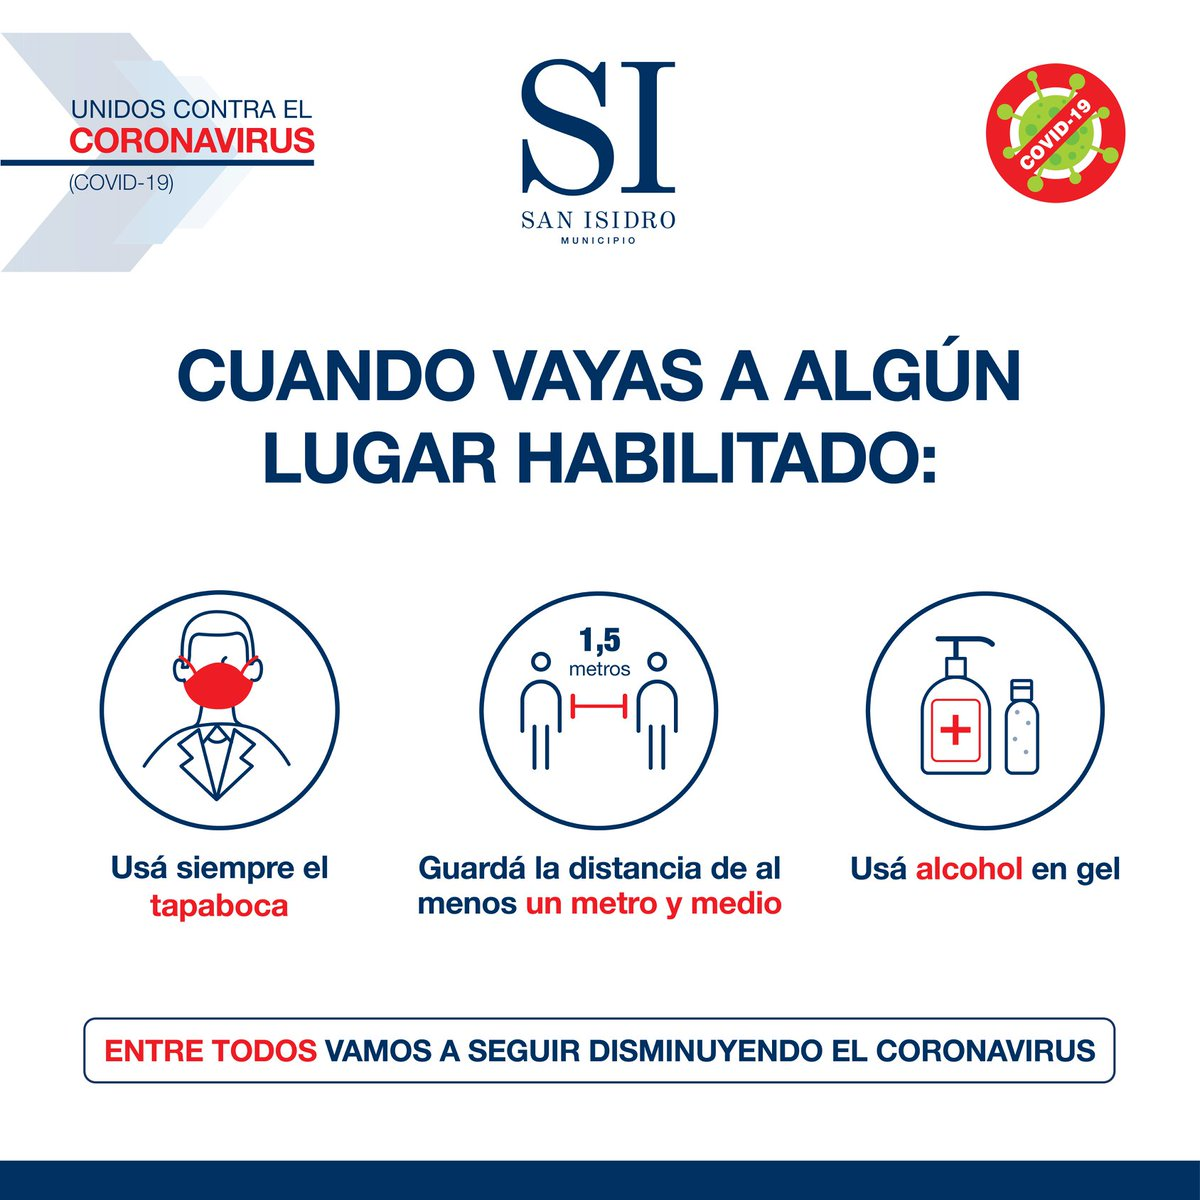 Estas son las cifras de coronavirus en San Isidro al 05/07/20: -Confirmados: 912 -Descartados: 3081 -En estudio: 289 -Recuperados: 243 -Fallecidos: 23 -Activos: 646 https://t.co/nVPe7yikok